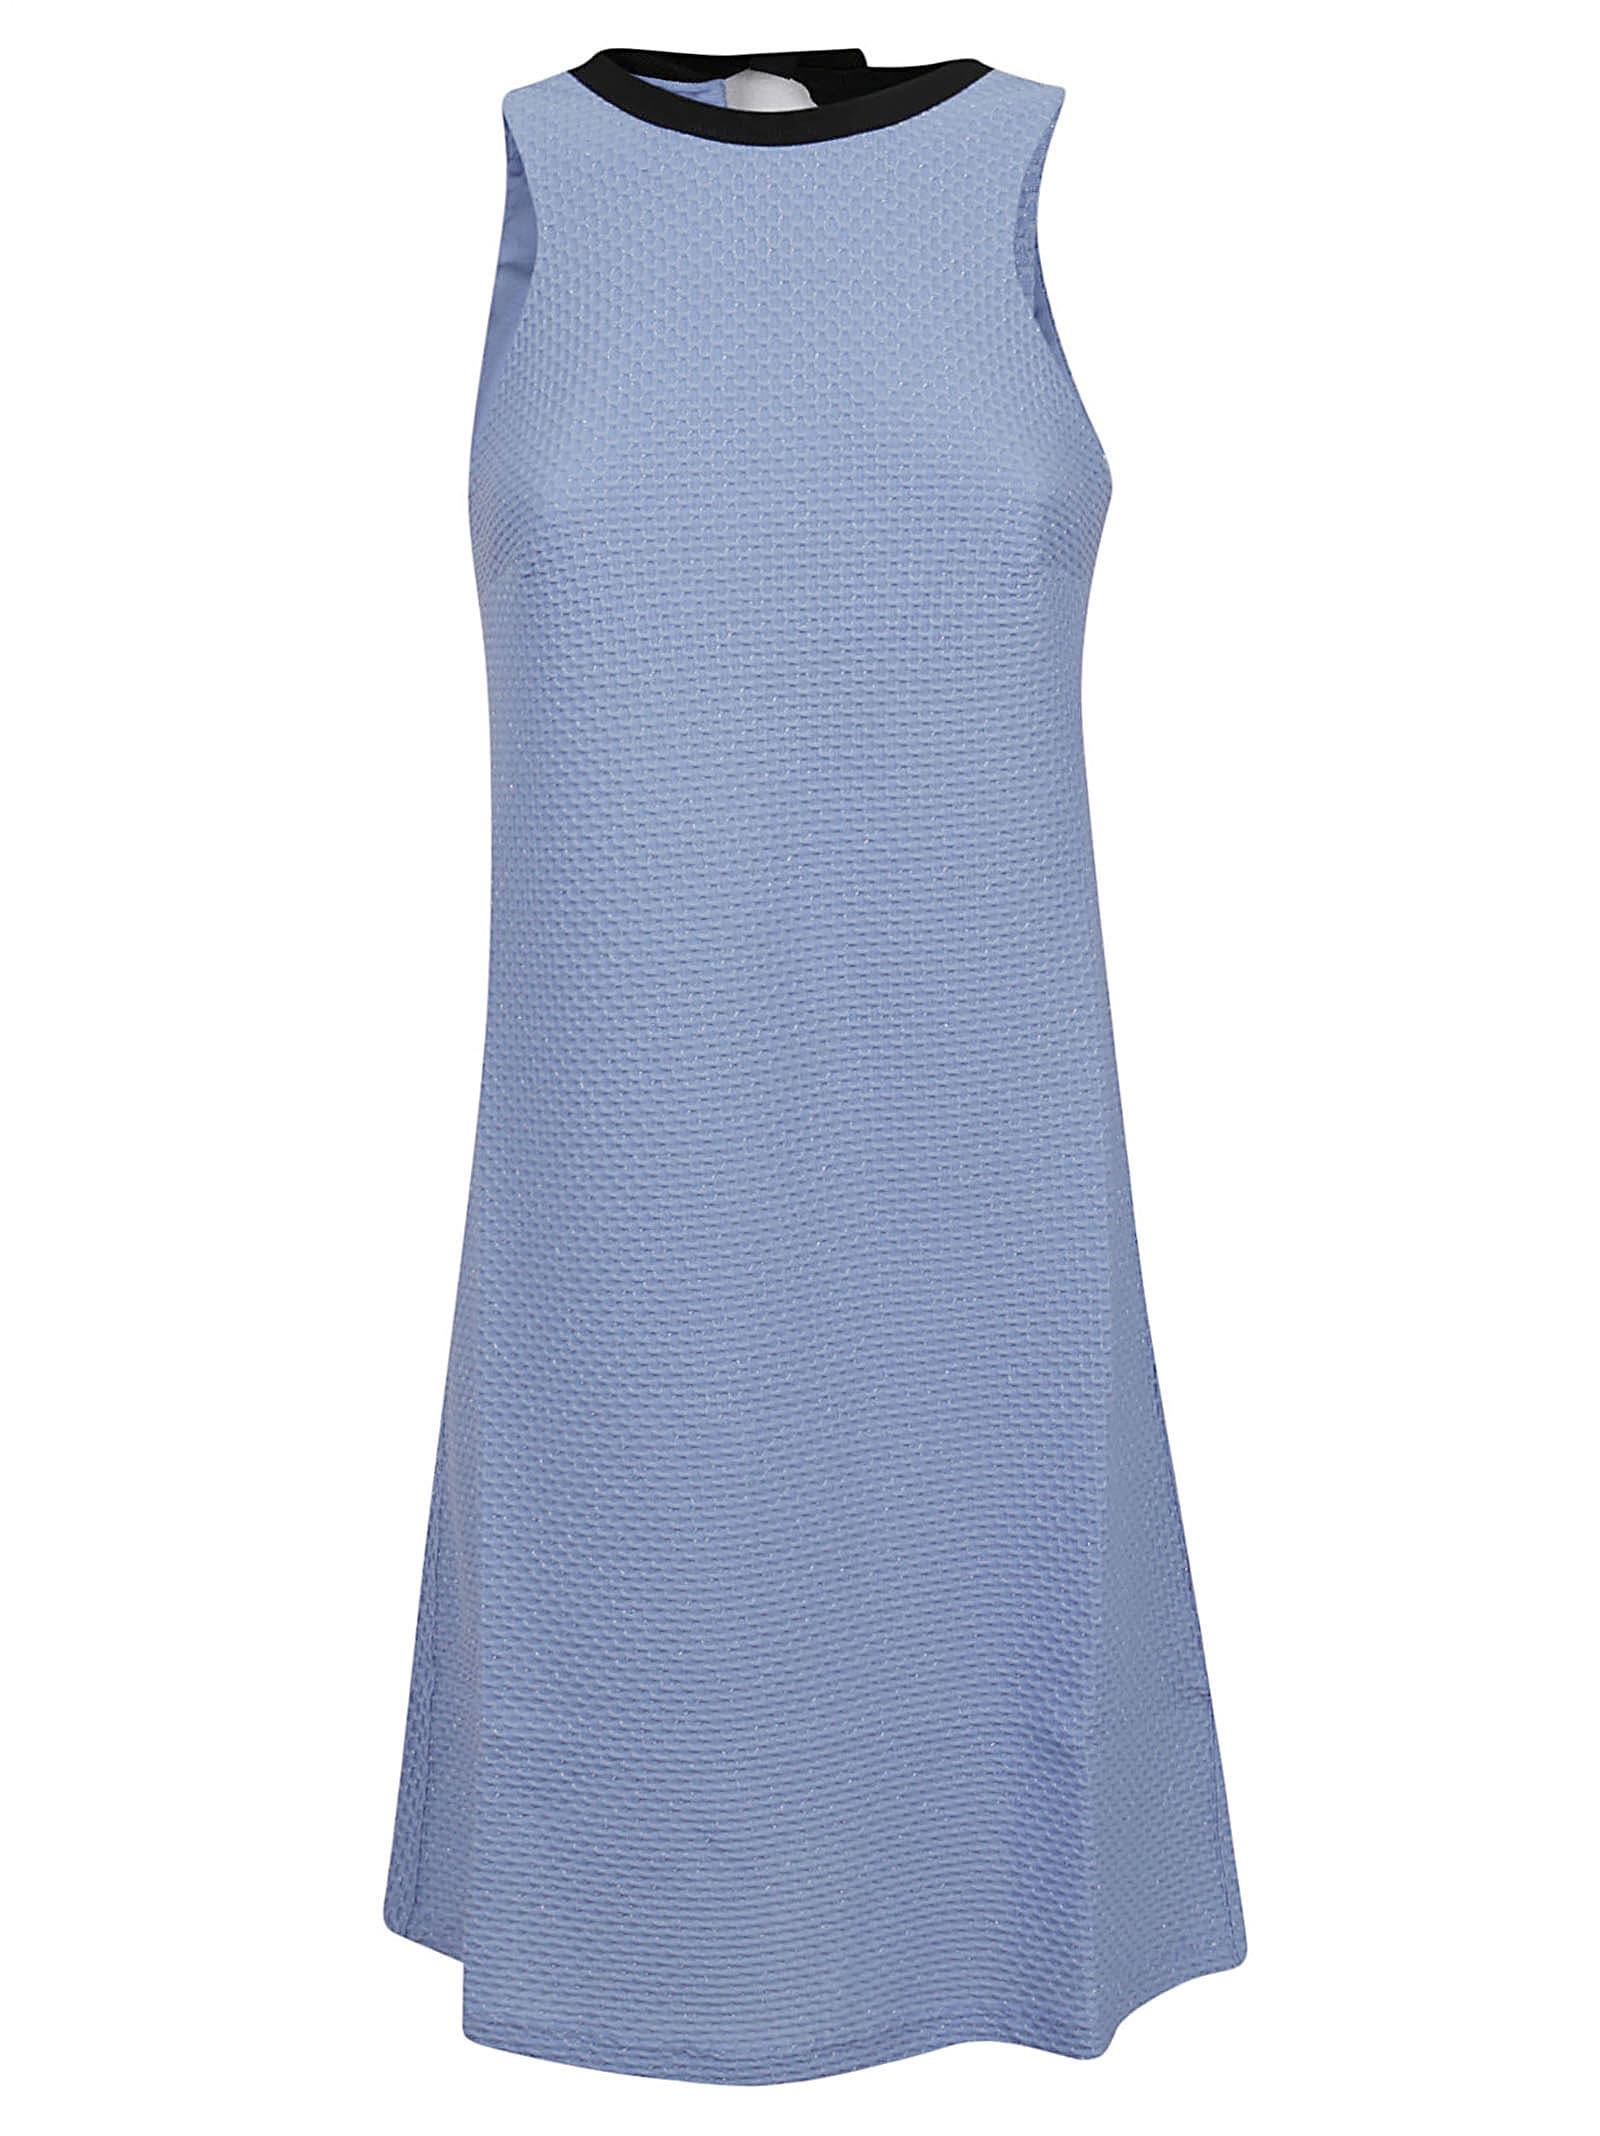 Buy Fisico - Cristina Ferrari Sleeveless Dress online, shop Fisico - Cristina Ferrari with free shipping